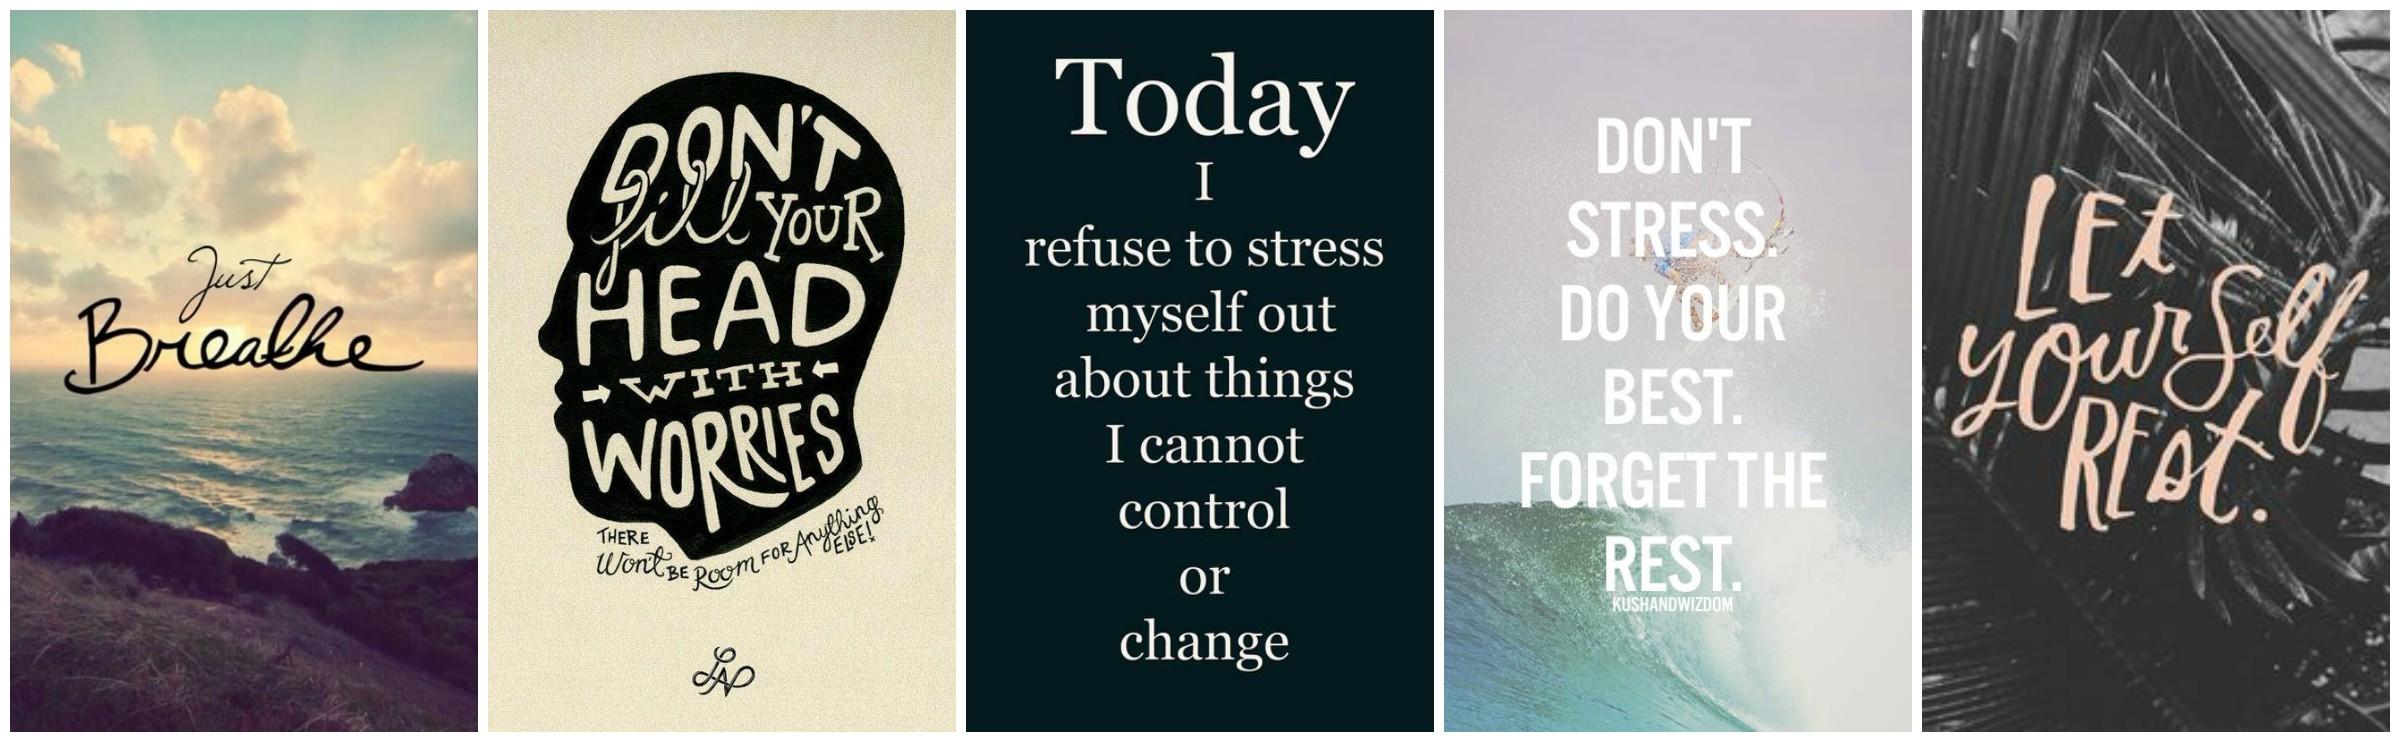 relief stress.jpg